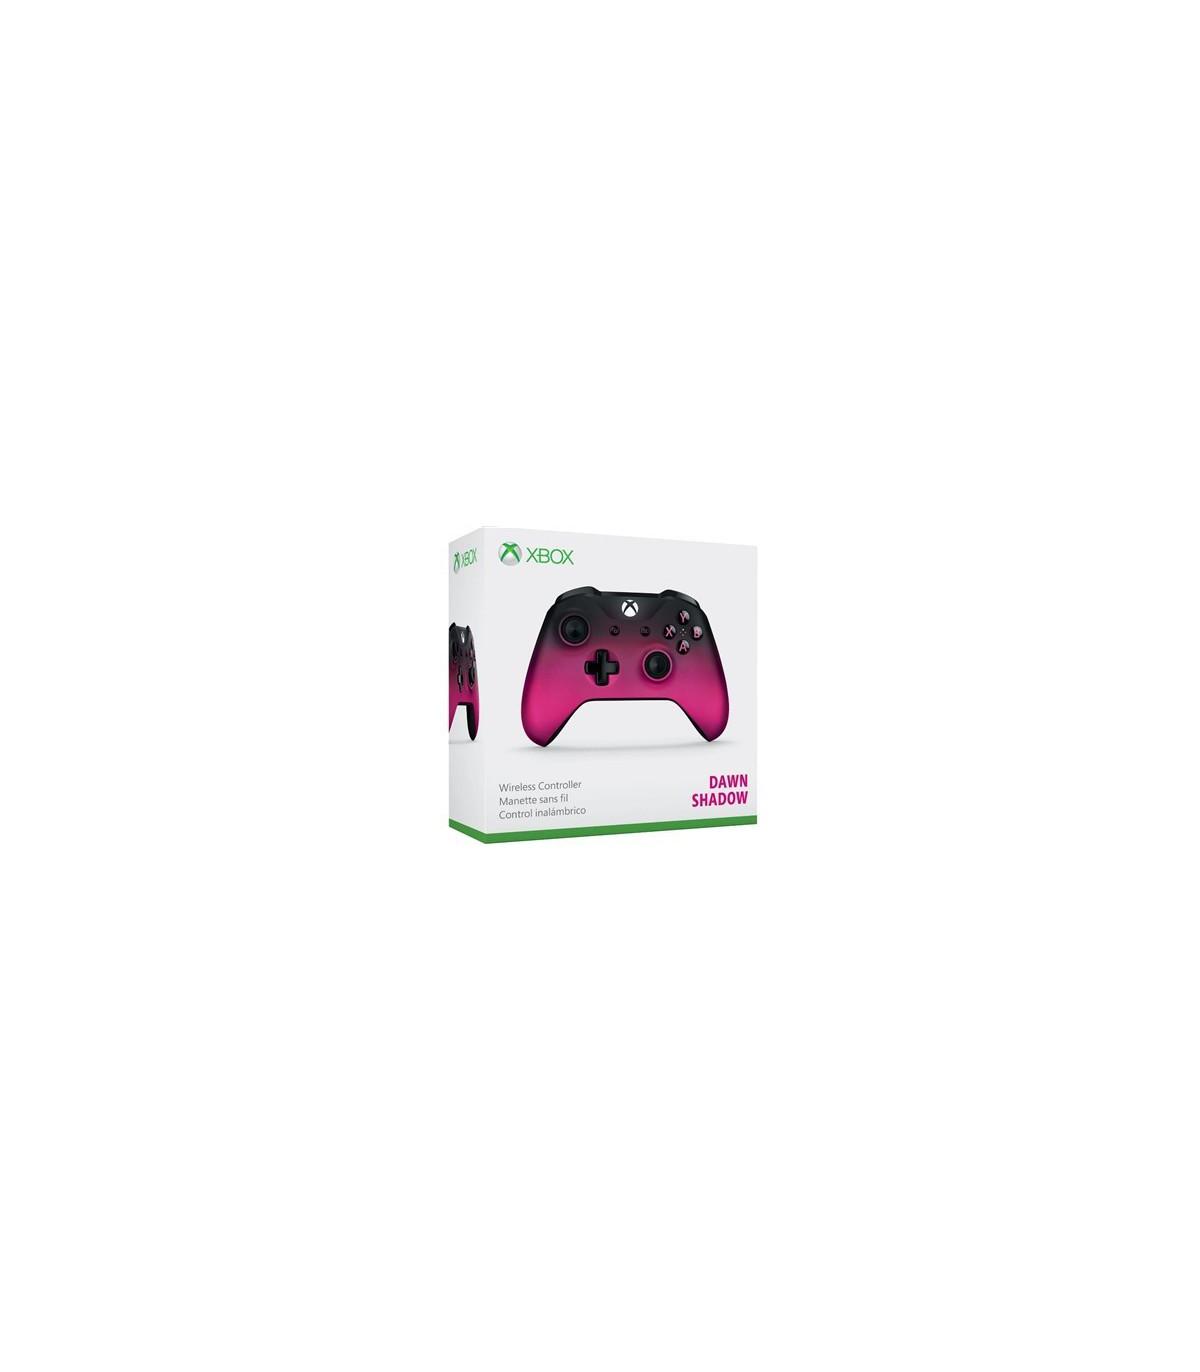 XBOX ONE Controller Dawn Shadow Special Edition